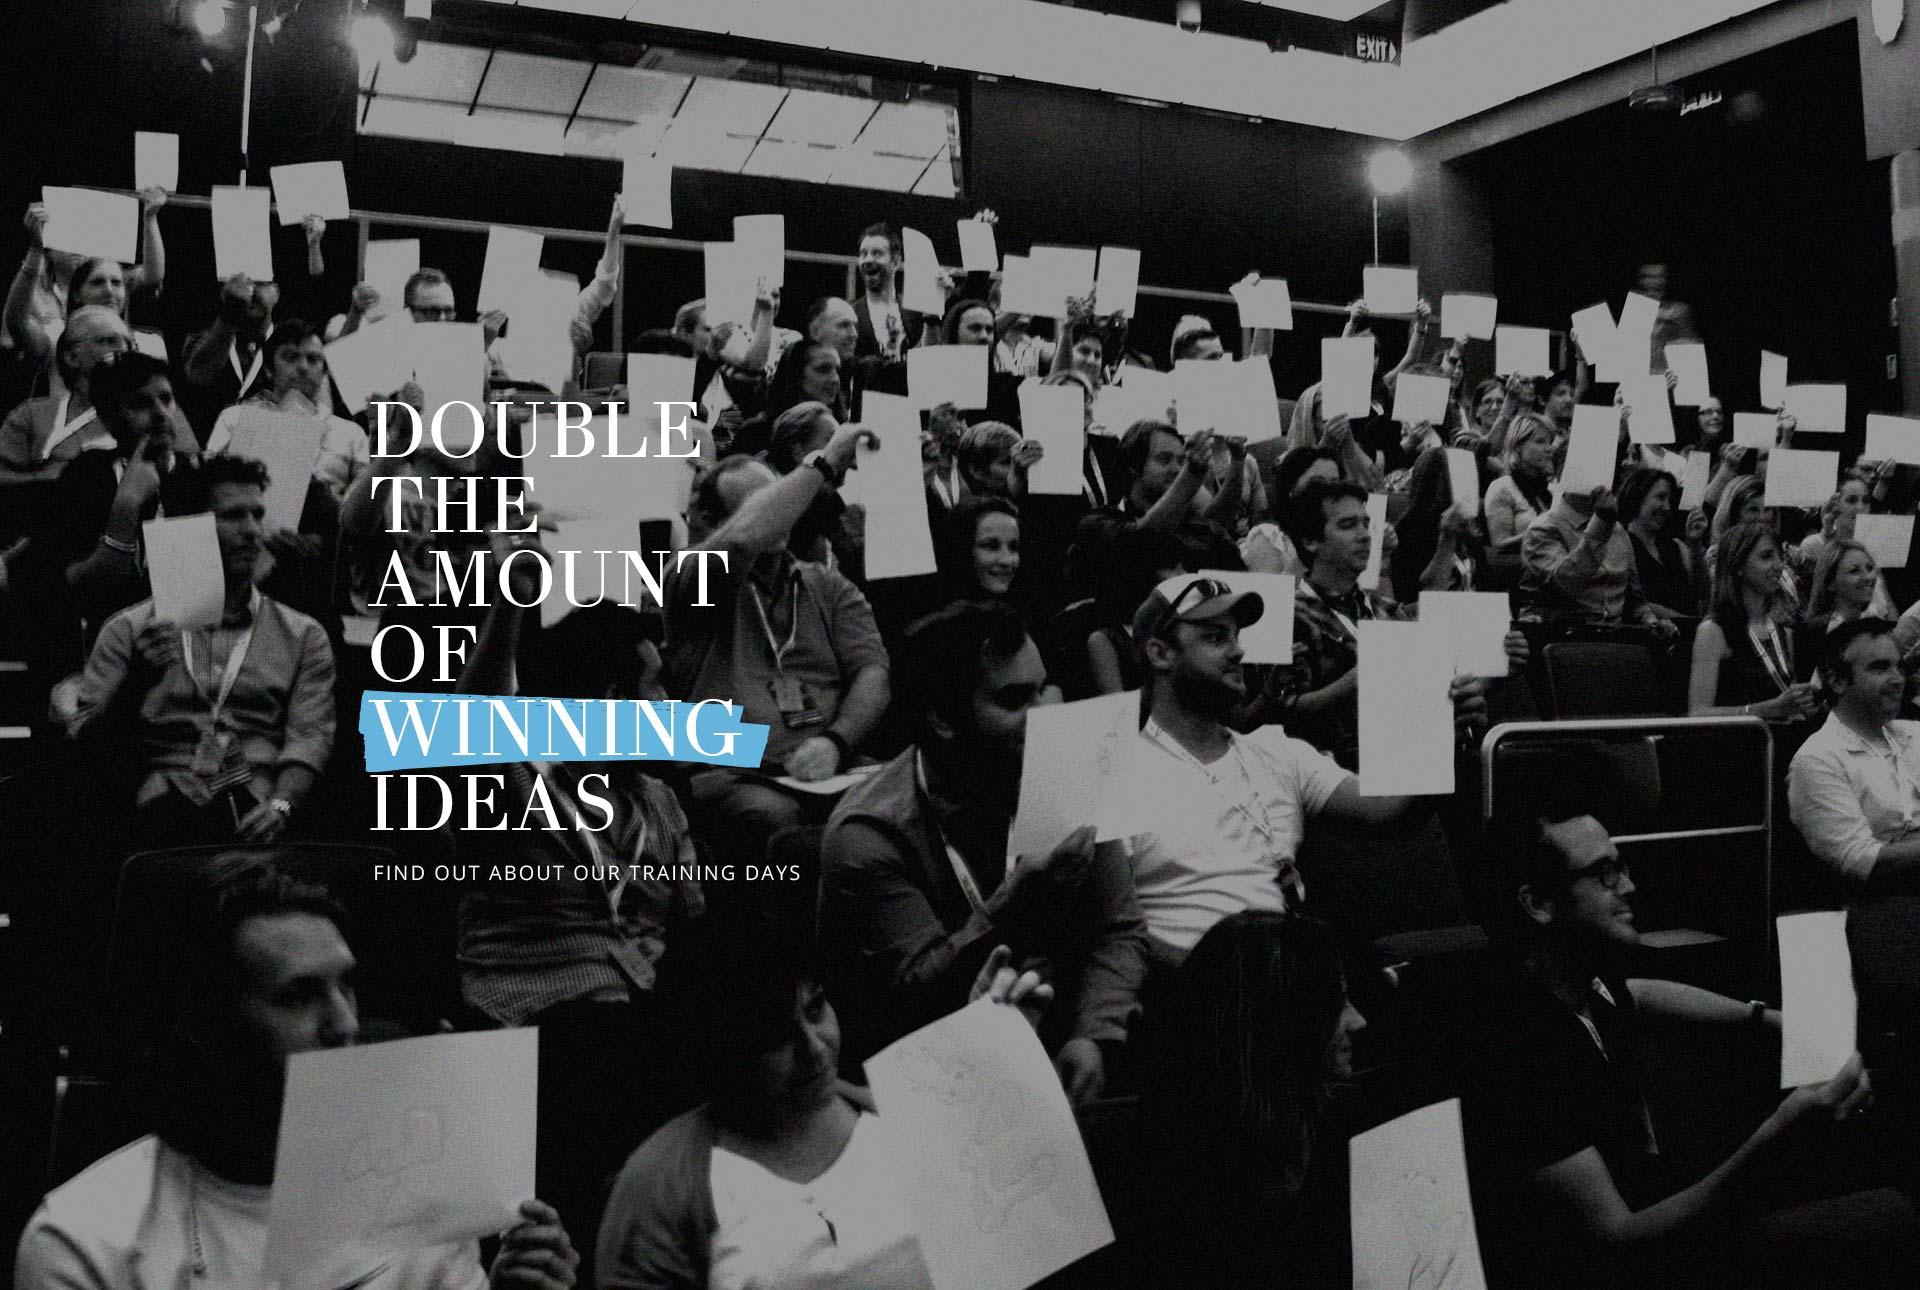 Double winning ideas